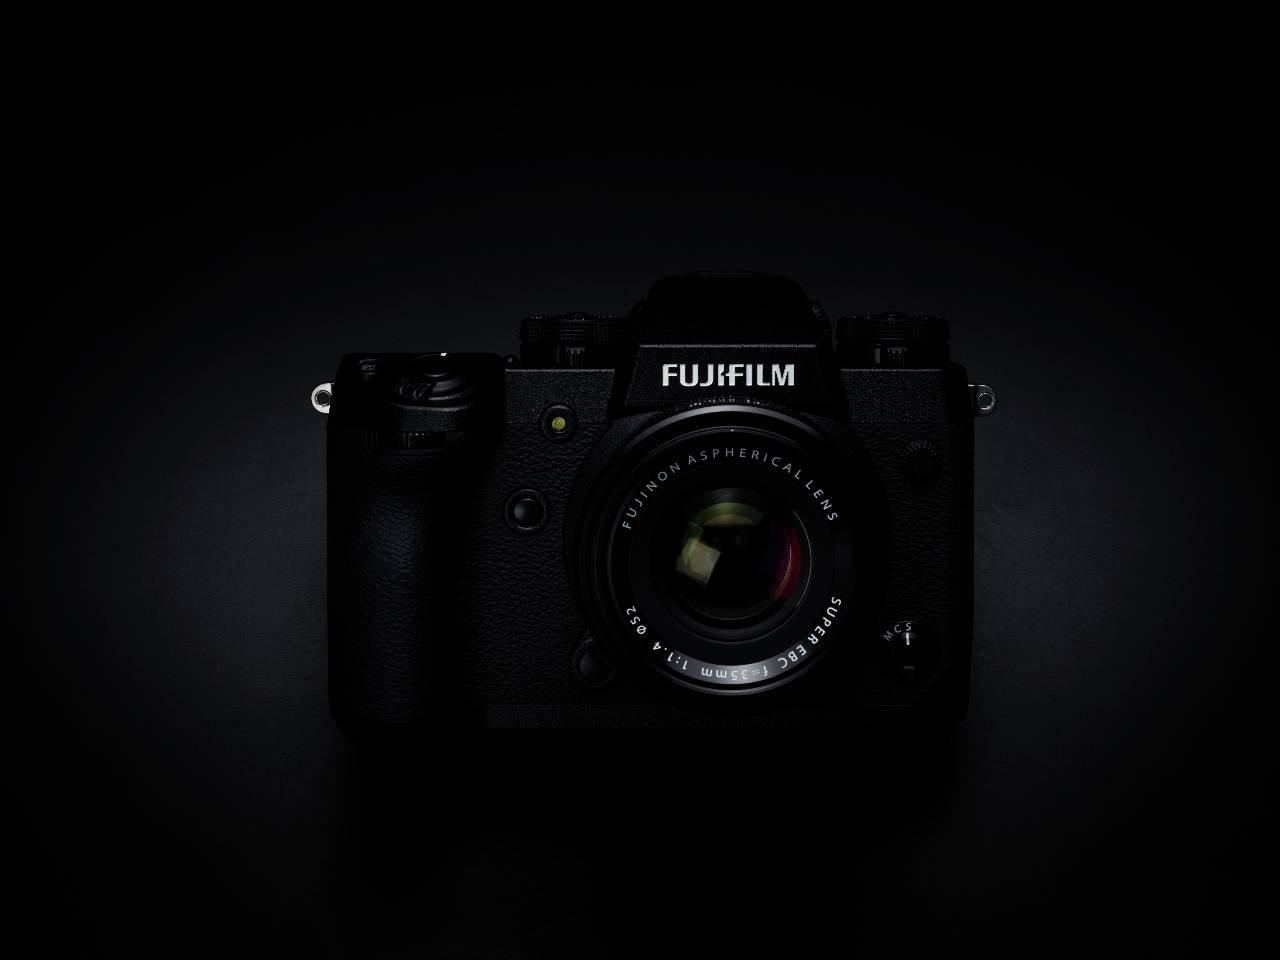 Fujifilm X-H1 spiegellose Systemkamera - Pro und Contra